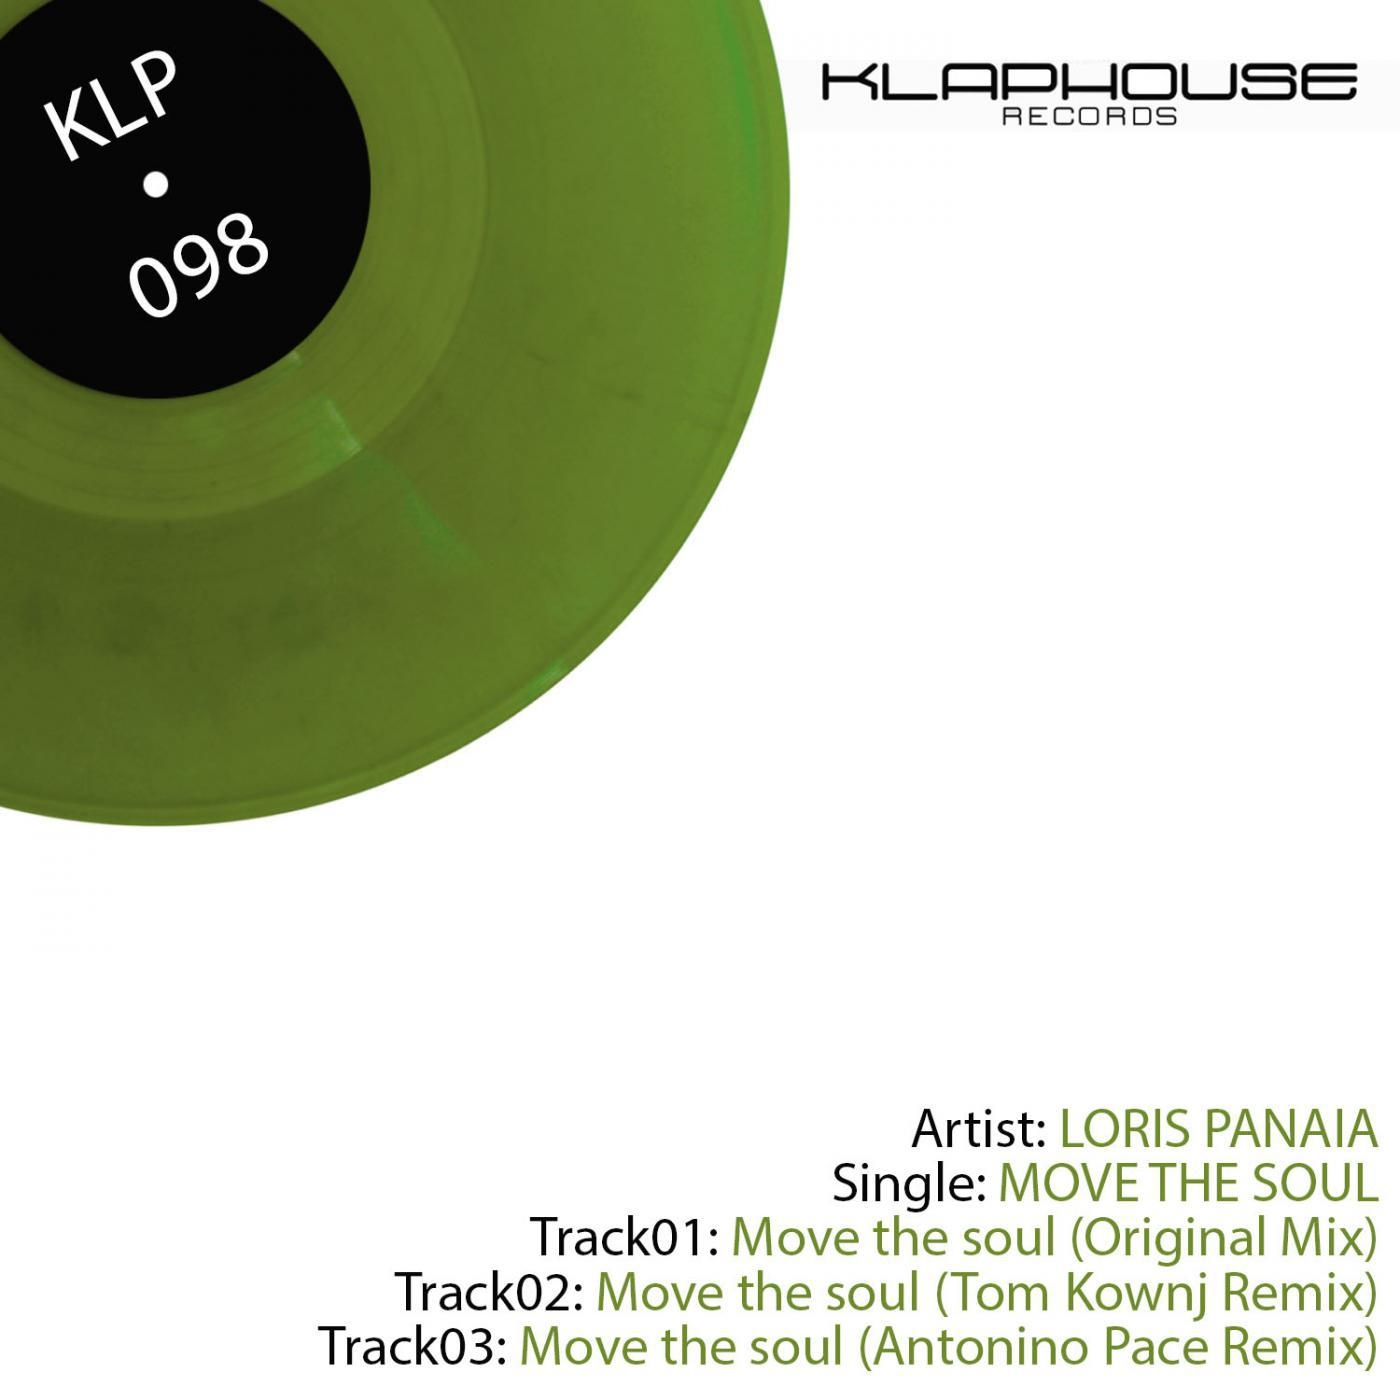 Loris Panaia - Move The Soul Remix (Antonino Pace remix)